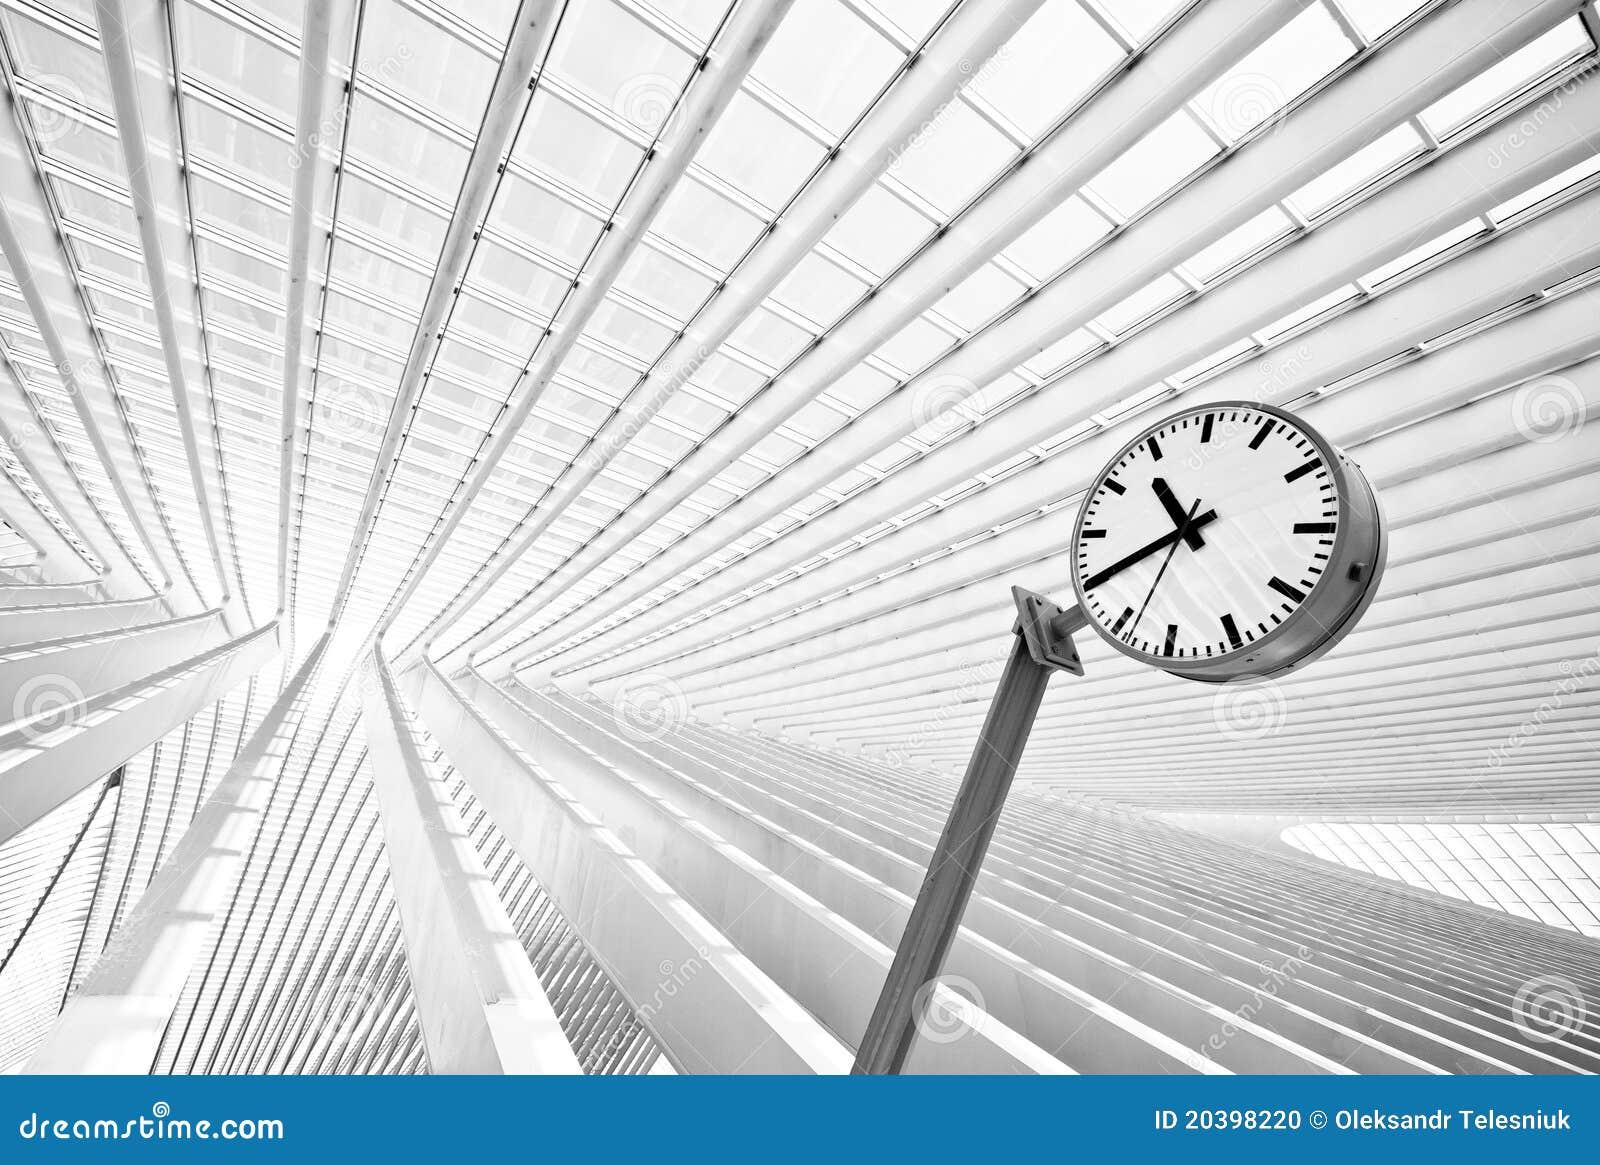 Futuristic Clock Simple Round Clock In Futuristic Interior Stock Photo Image